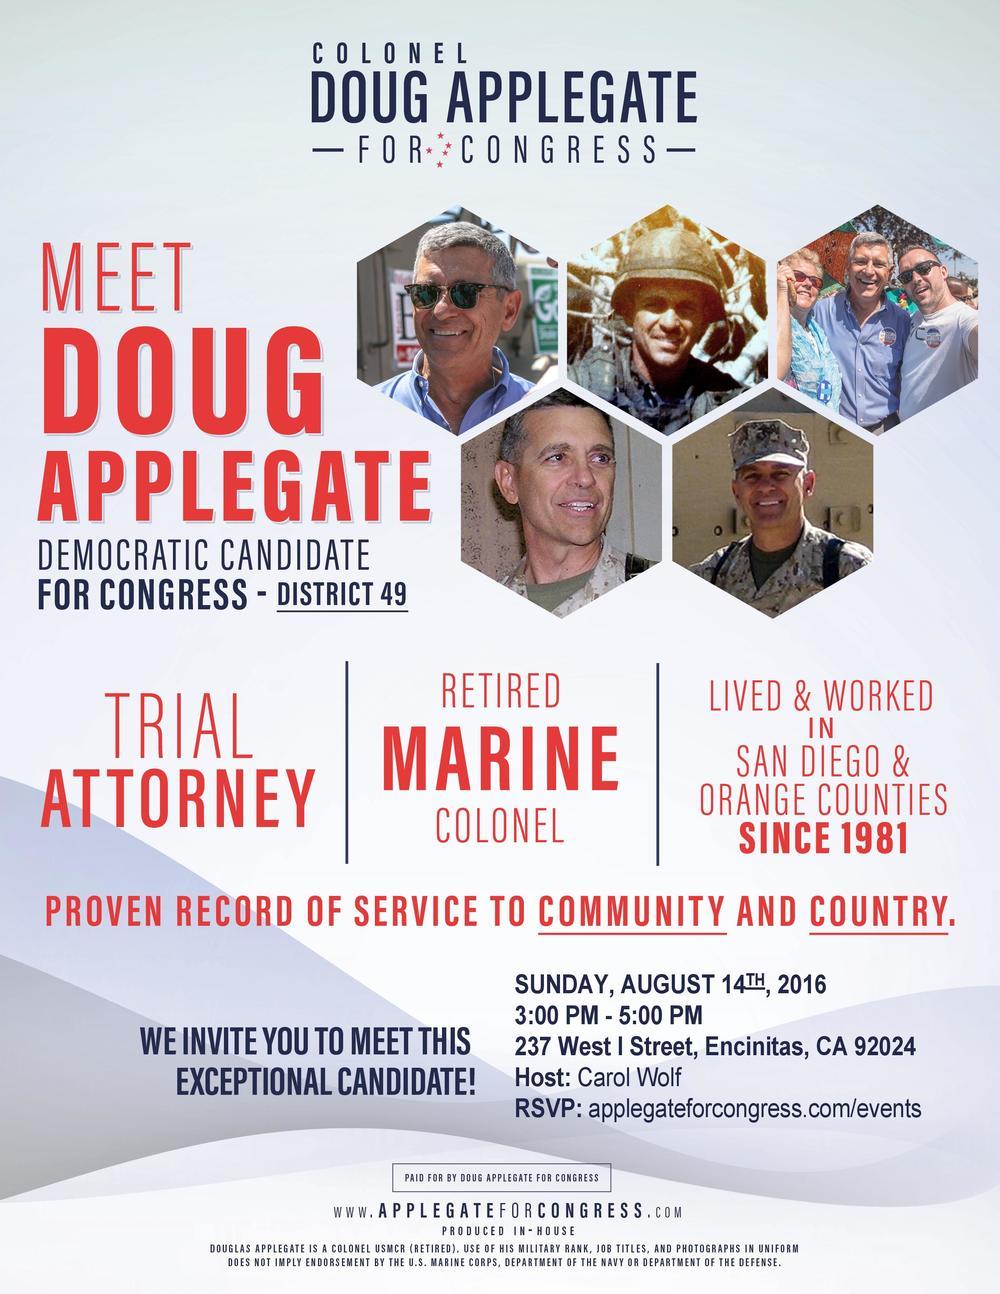 Meet And Greet Colonel Doug Applegate With Carol Wolf Doug